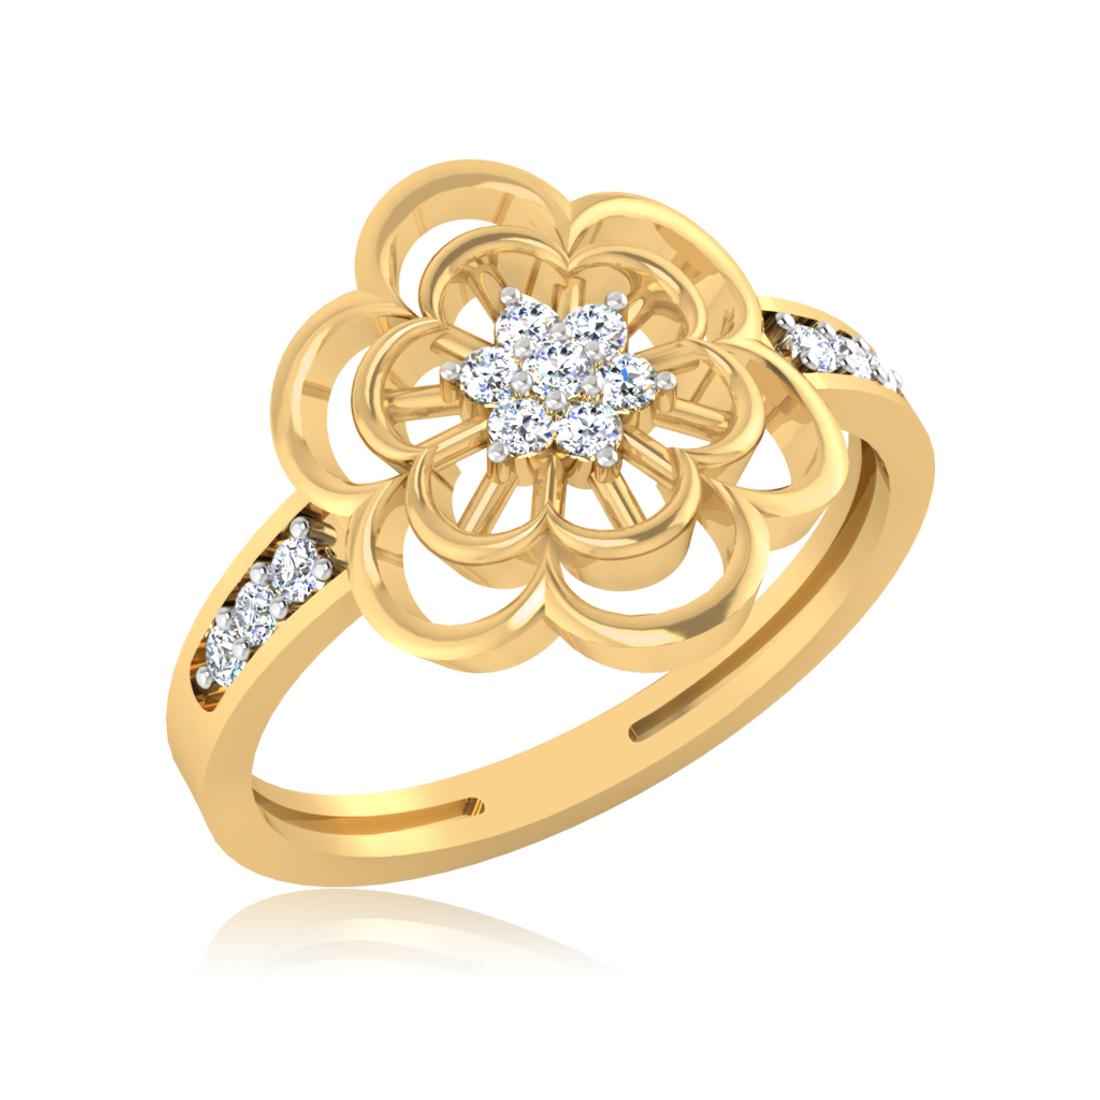 Iski Uski Zealous Ring